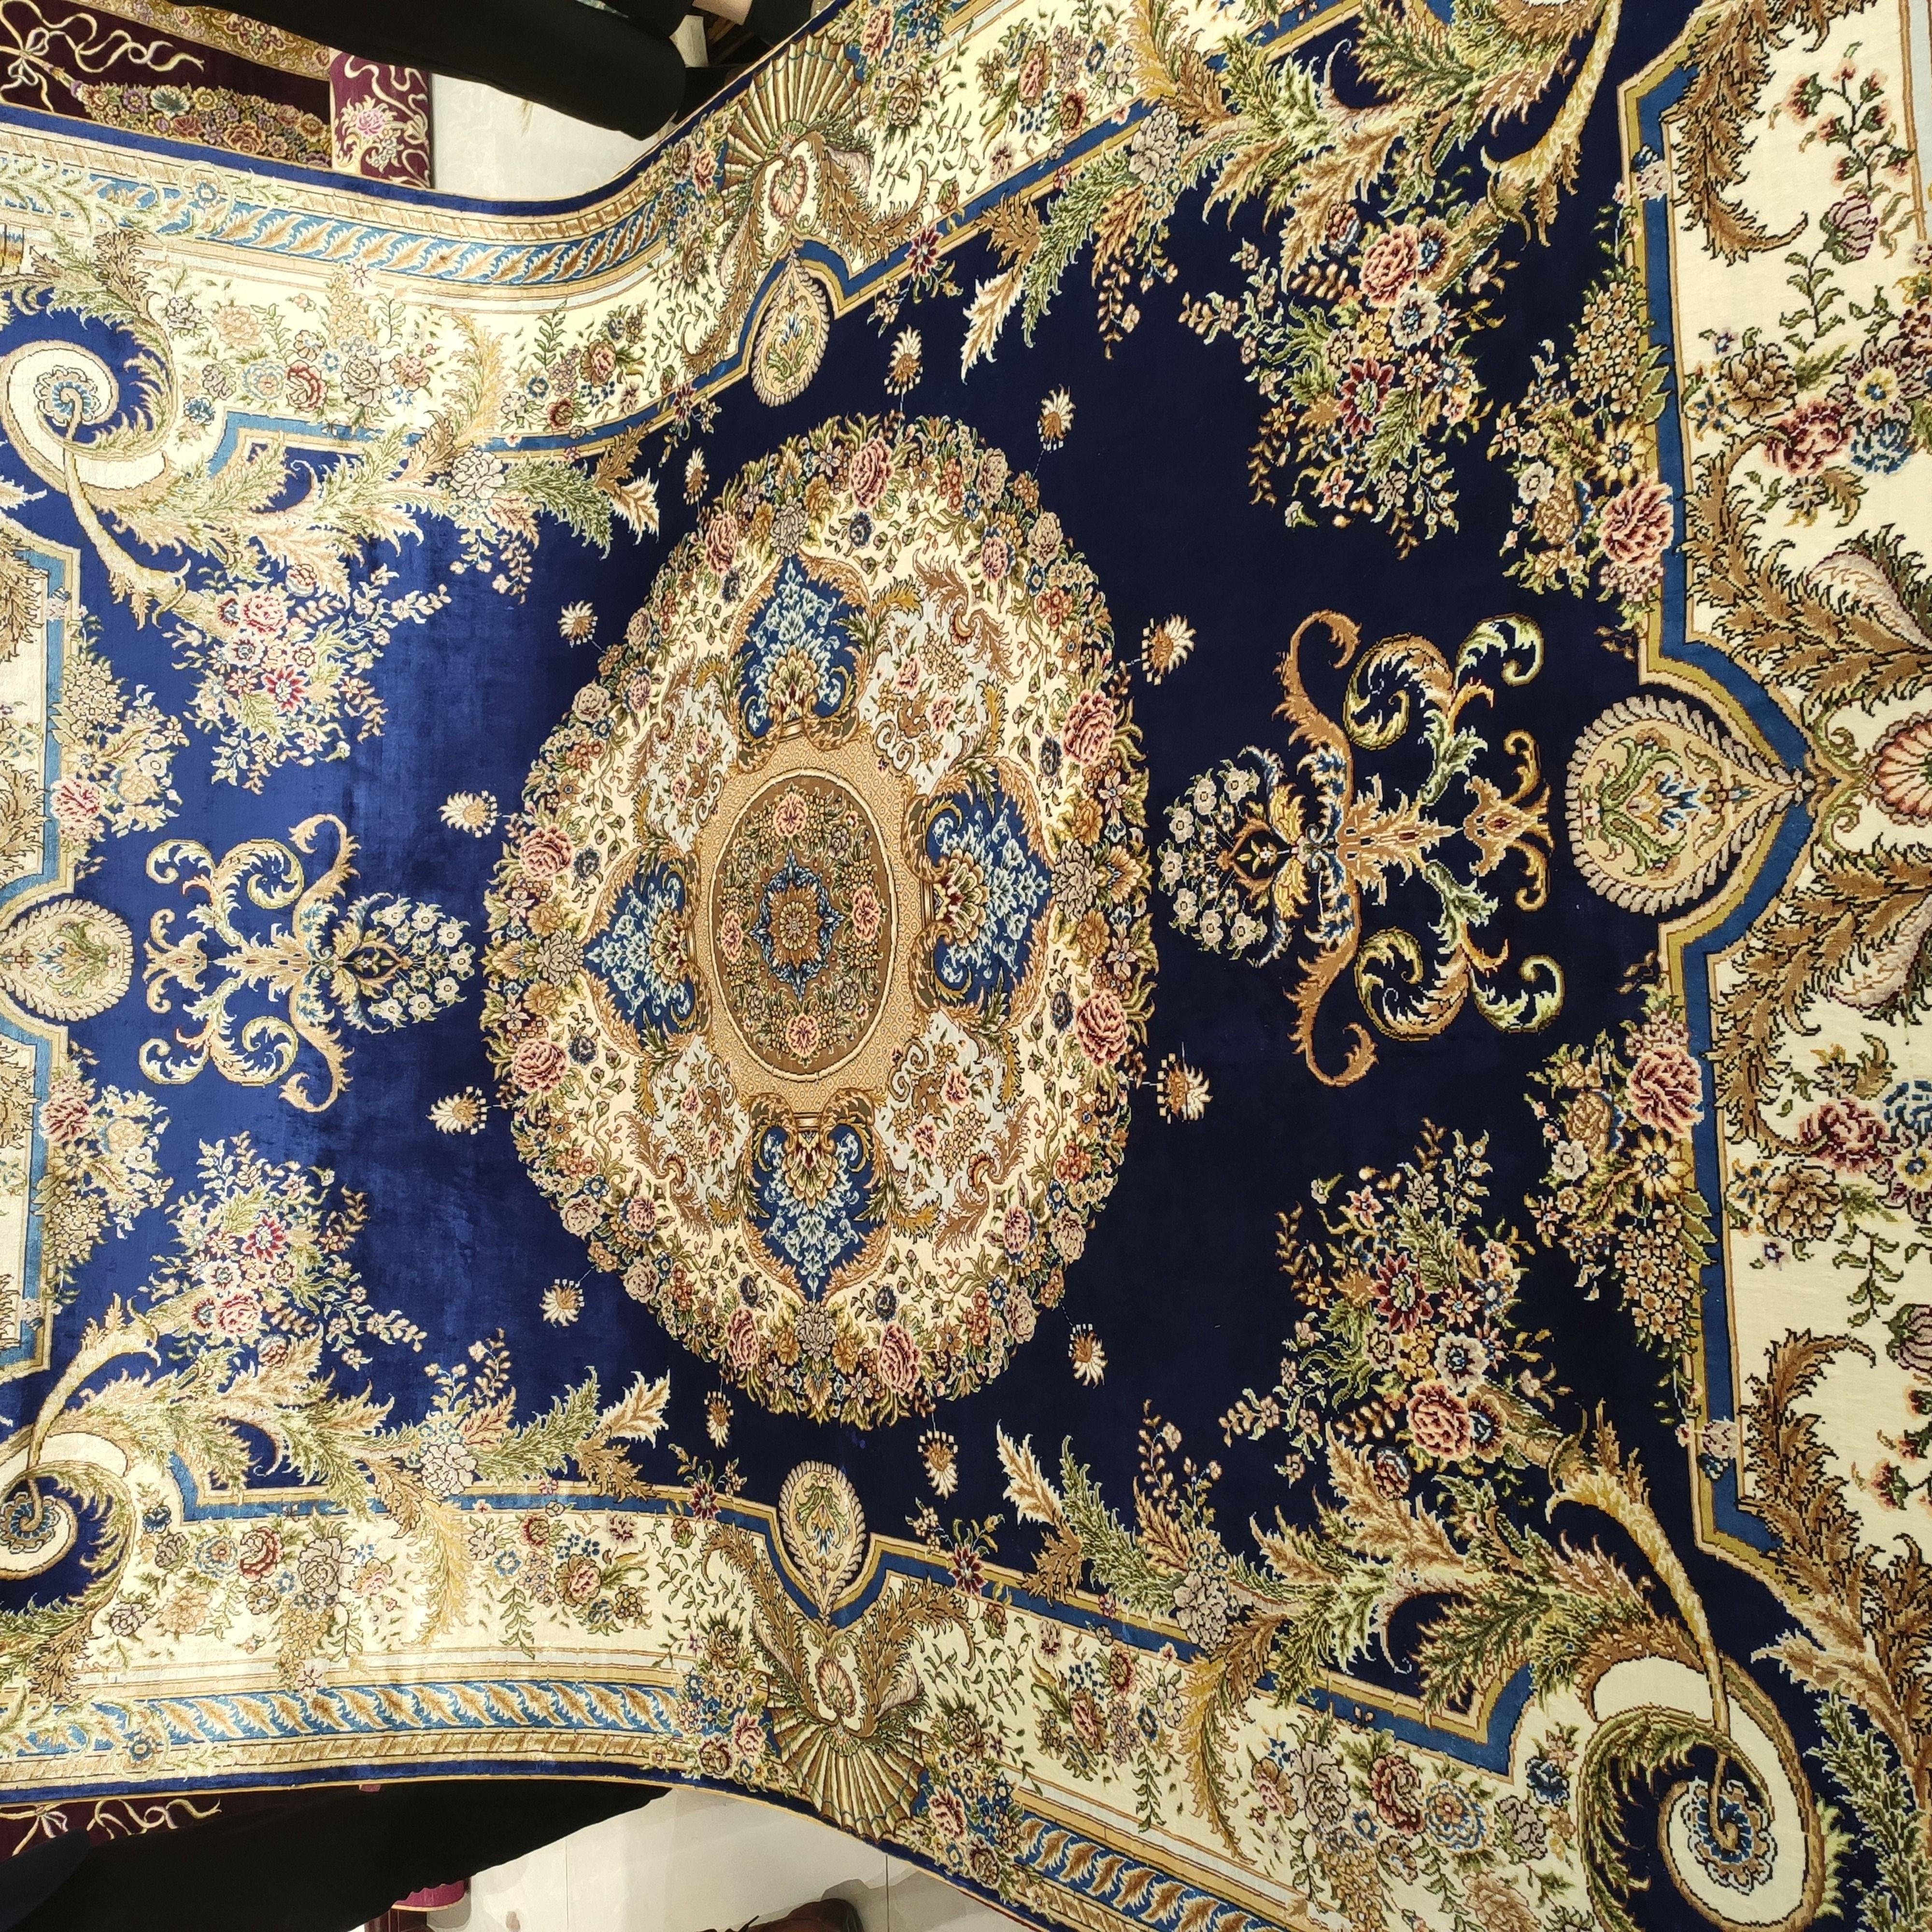 5x7ft Persian Design Silk Handmade Carpets Rugs Persiancarpets Silkcarpetsfactory Handmadecarpet Handmade Silk Rugs On Carpet Carpet Handmade Silk Carpet